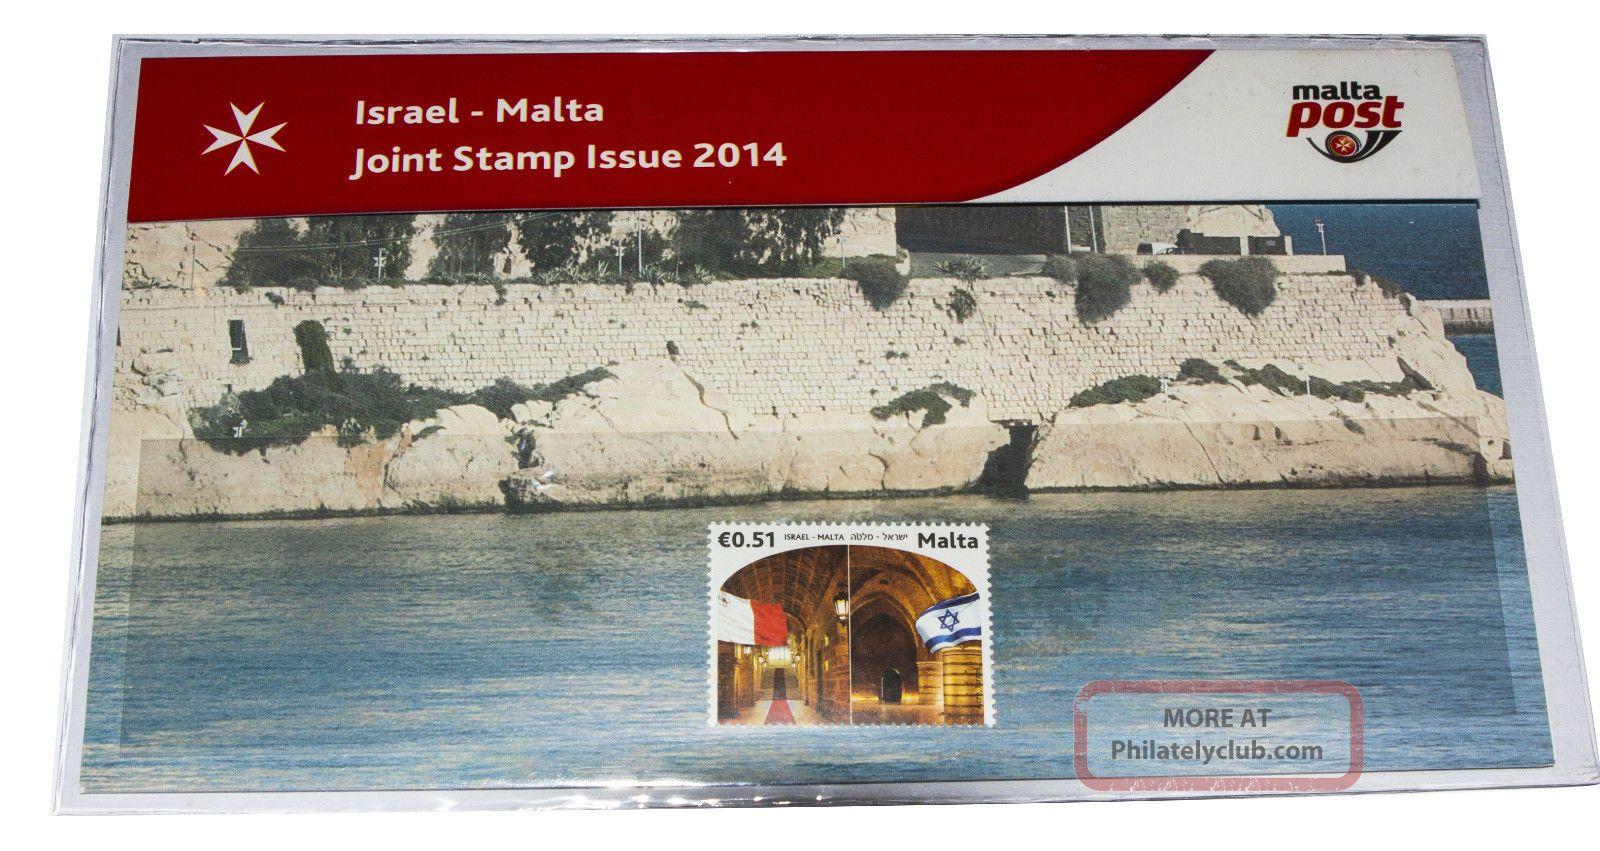 Malta Maltapost Israel Joint Issue The Knights Hospitaller Halls Valletta Pp Europe photo